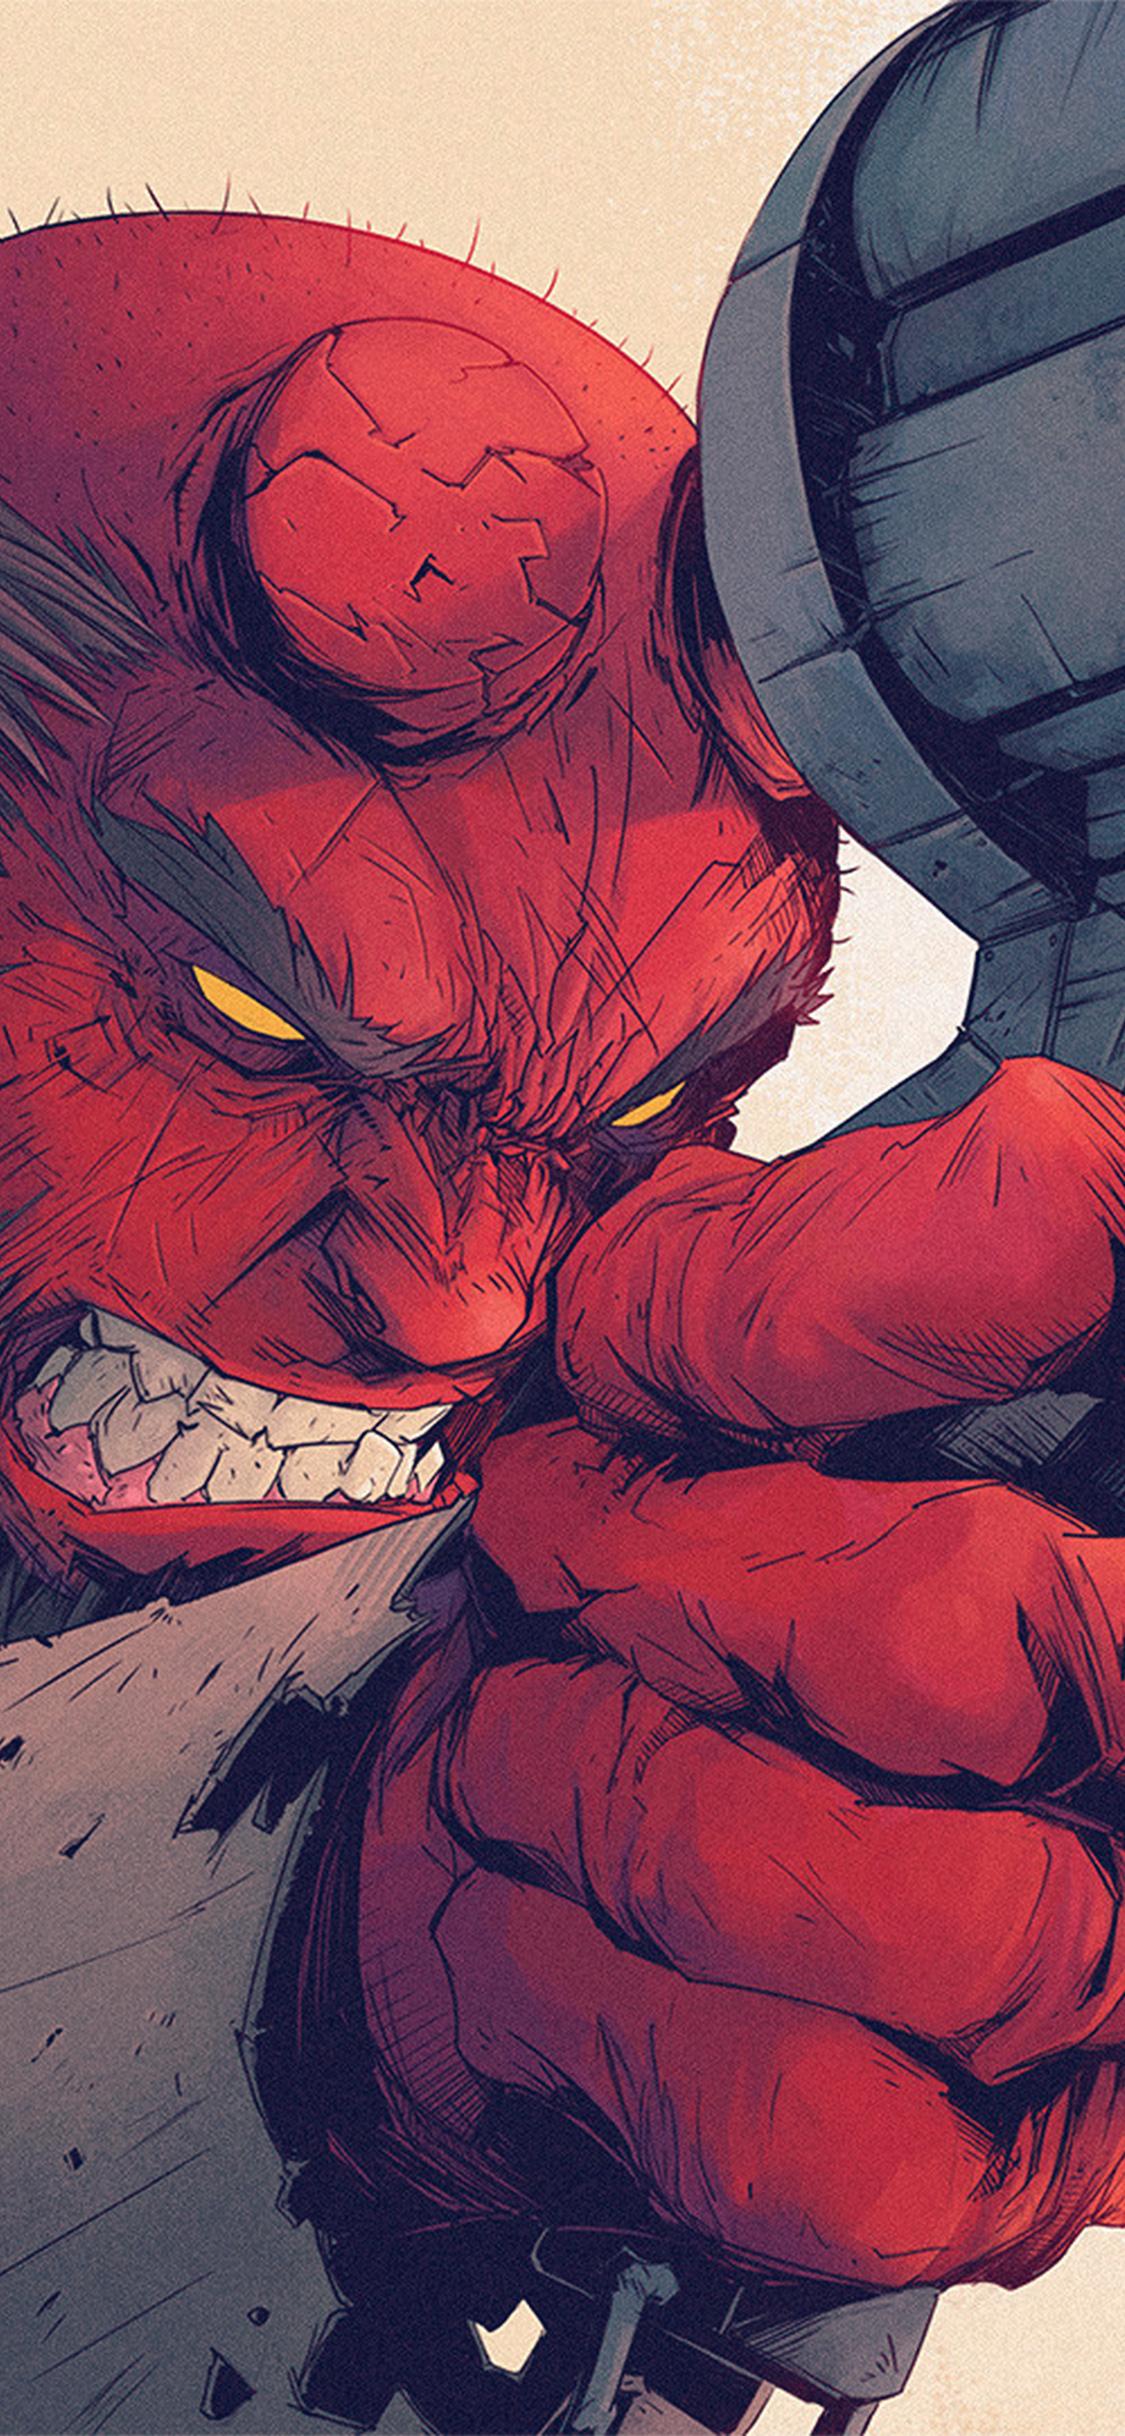 iPhoneXpapers.com-Apple-iPhone-wallpaper-ay00-tonton-revolver-hellboy-red-illustration-art